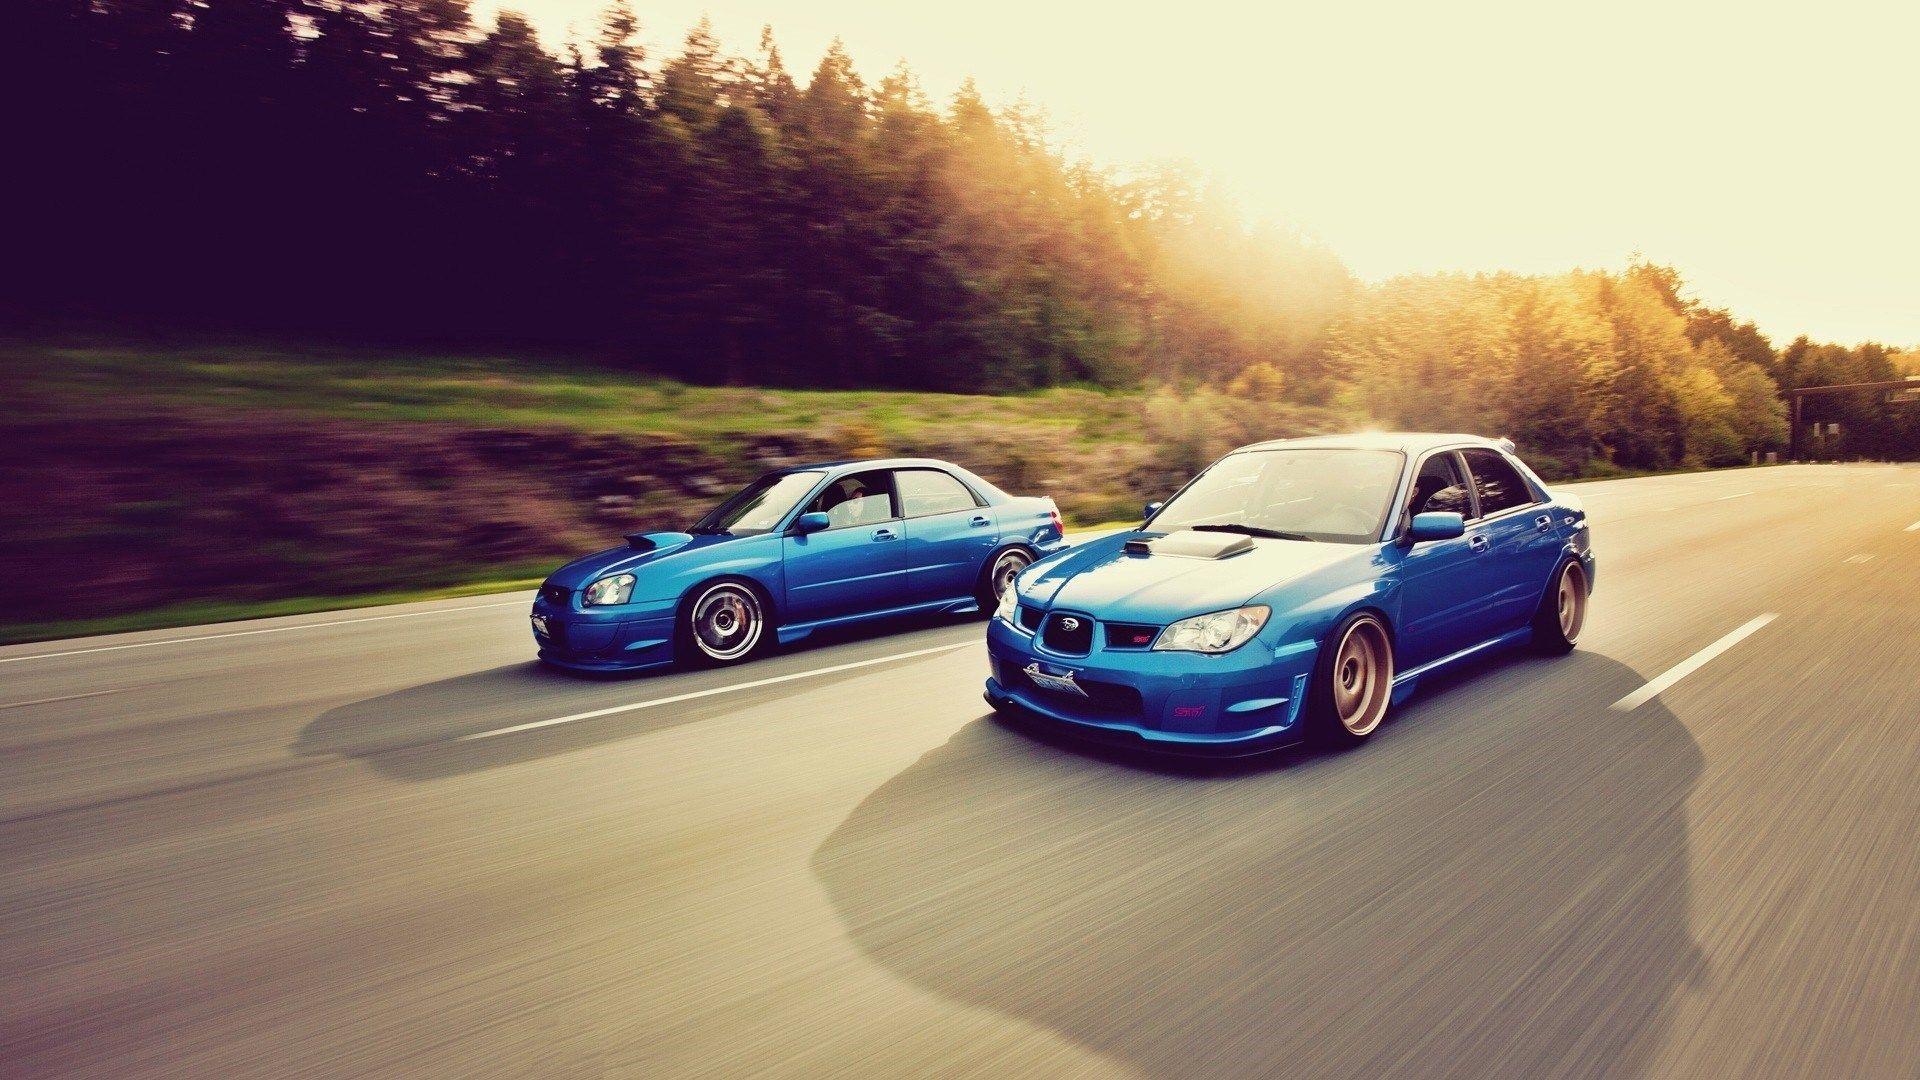 Cars Tuning Subaru Impreza Wrx Jdm Wallpaper: Subaru WRX STI Cars Tuning HD Wallpaper